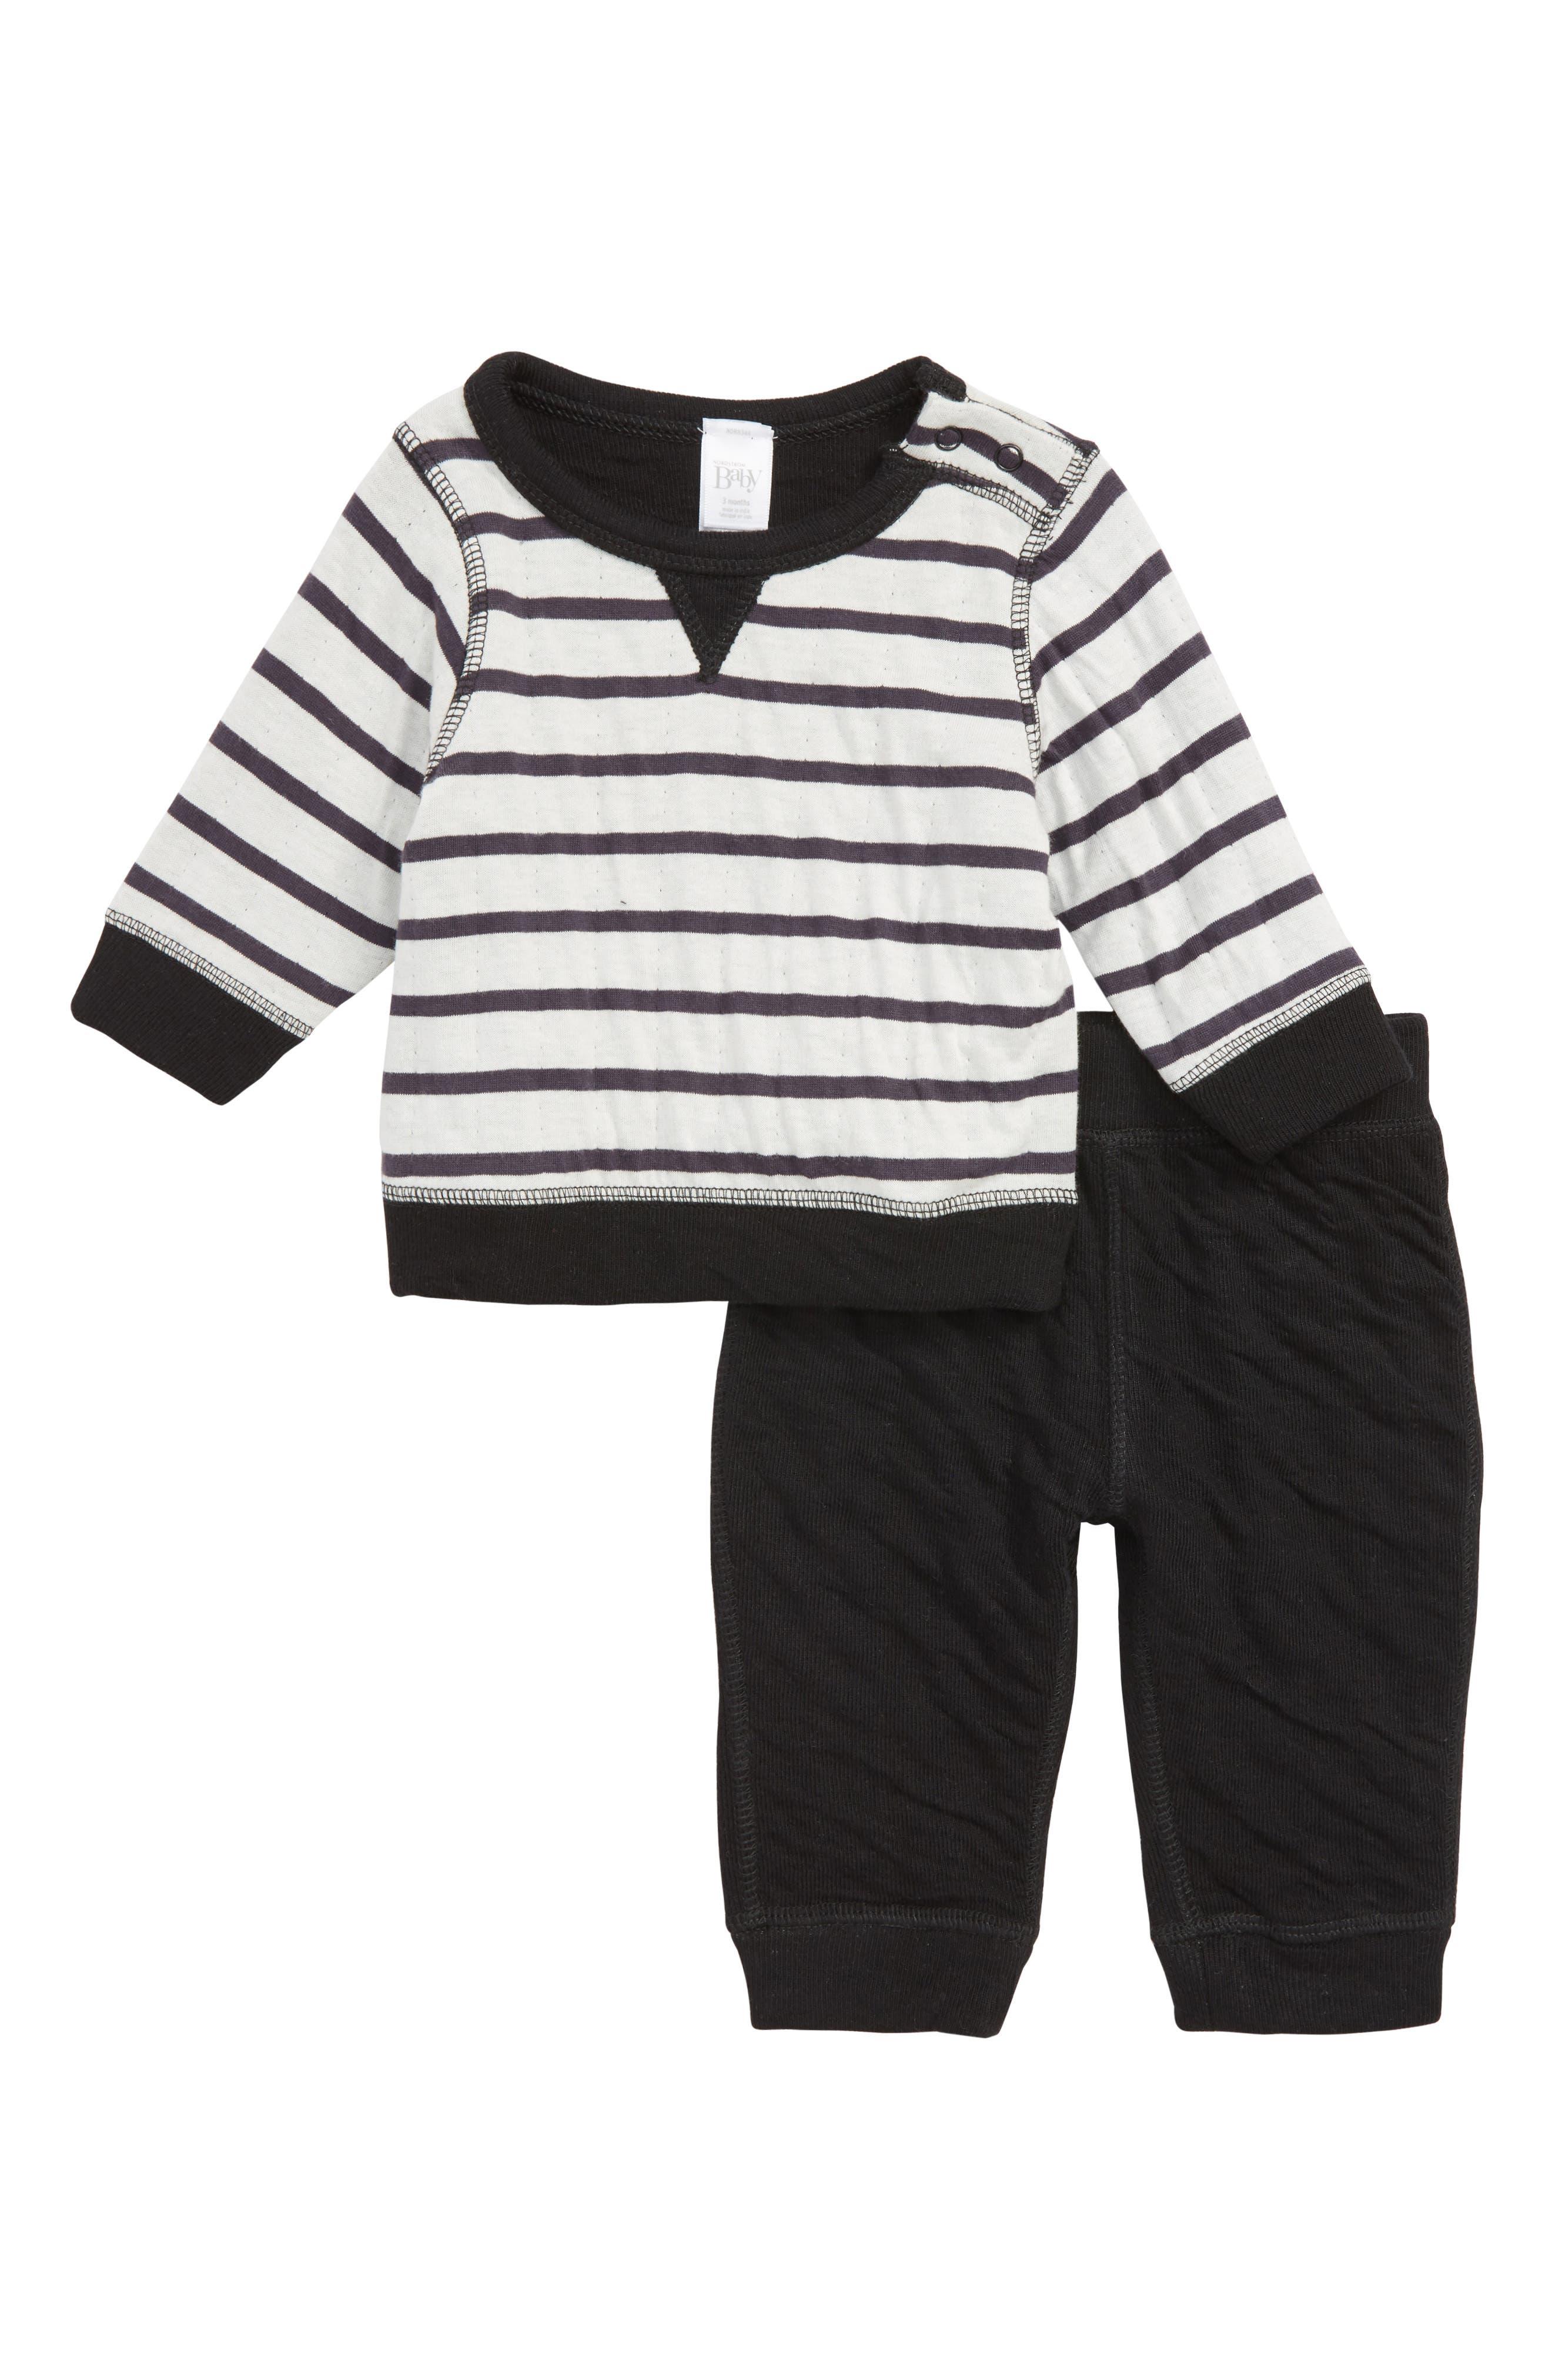 Reversible Double Knit T-Shirt & Pants Set,                         Main,                         color, BLACK BRETON STRIPE